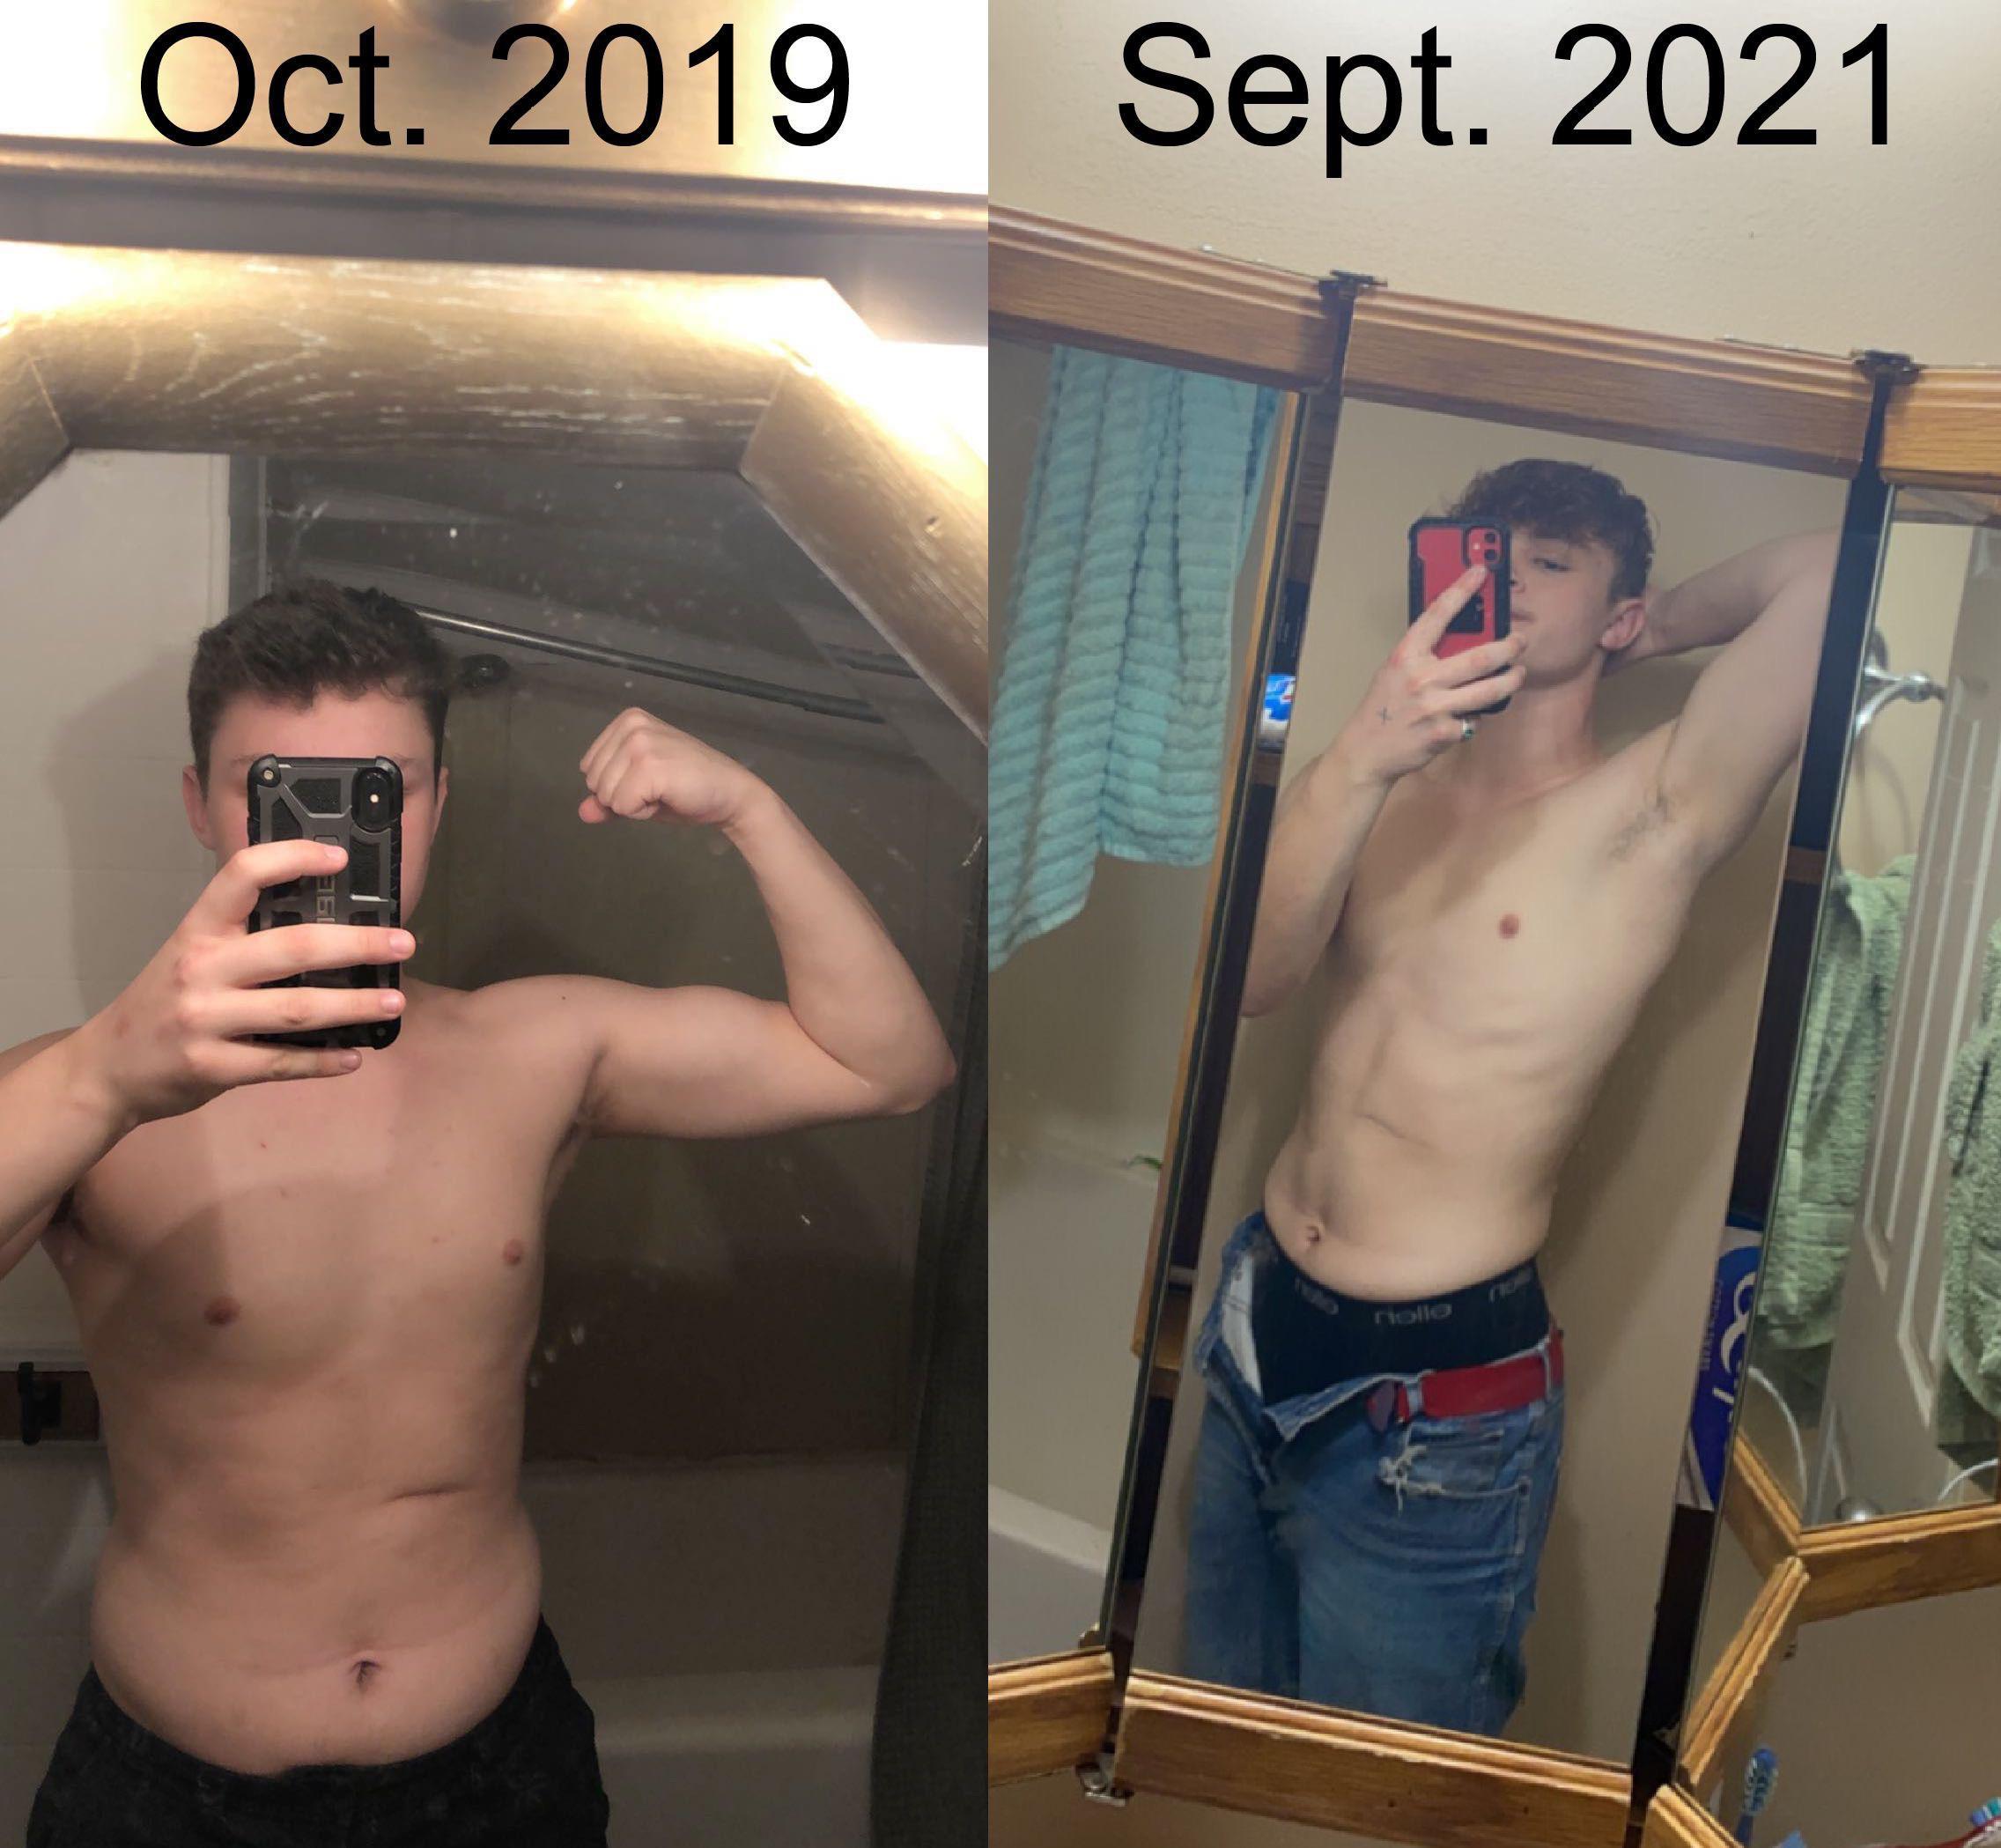 5 feet 10 Male Progress Pics of 60 lbs Weight Loss 225 lbs to 165 lbs